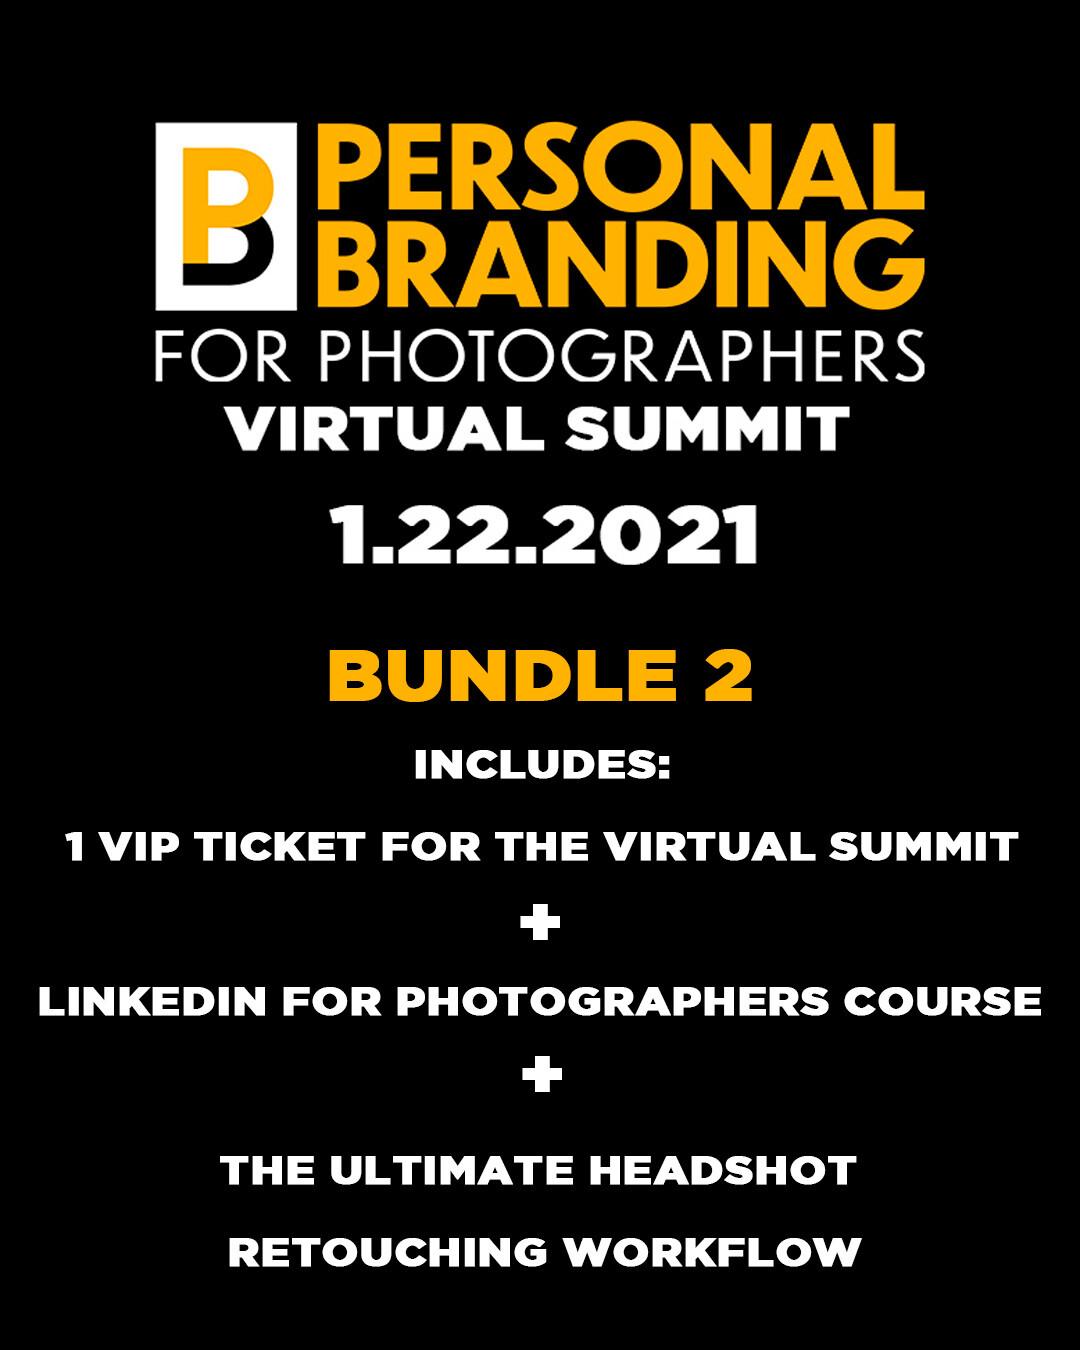 VIP Ticket + LinkedIn for Photographers + Retouching workflow bundle